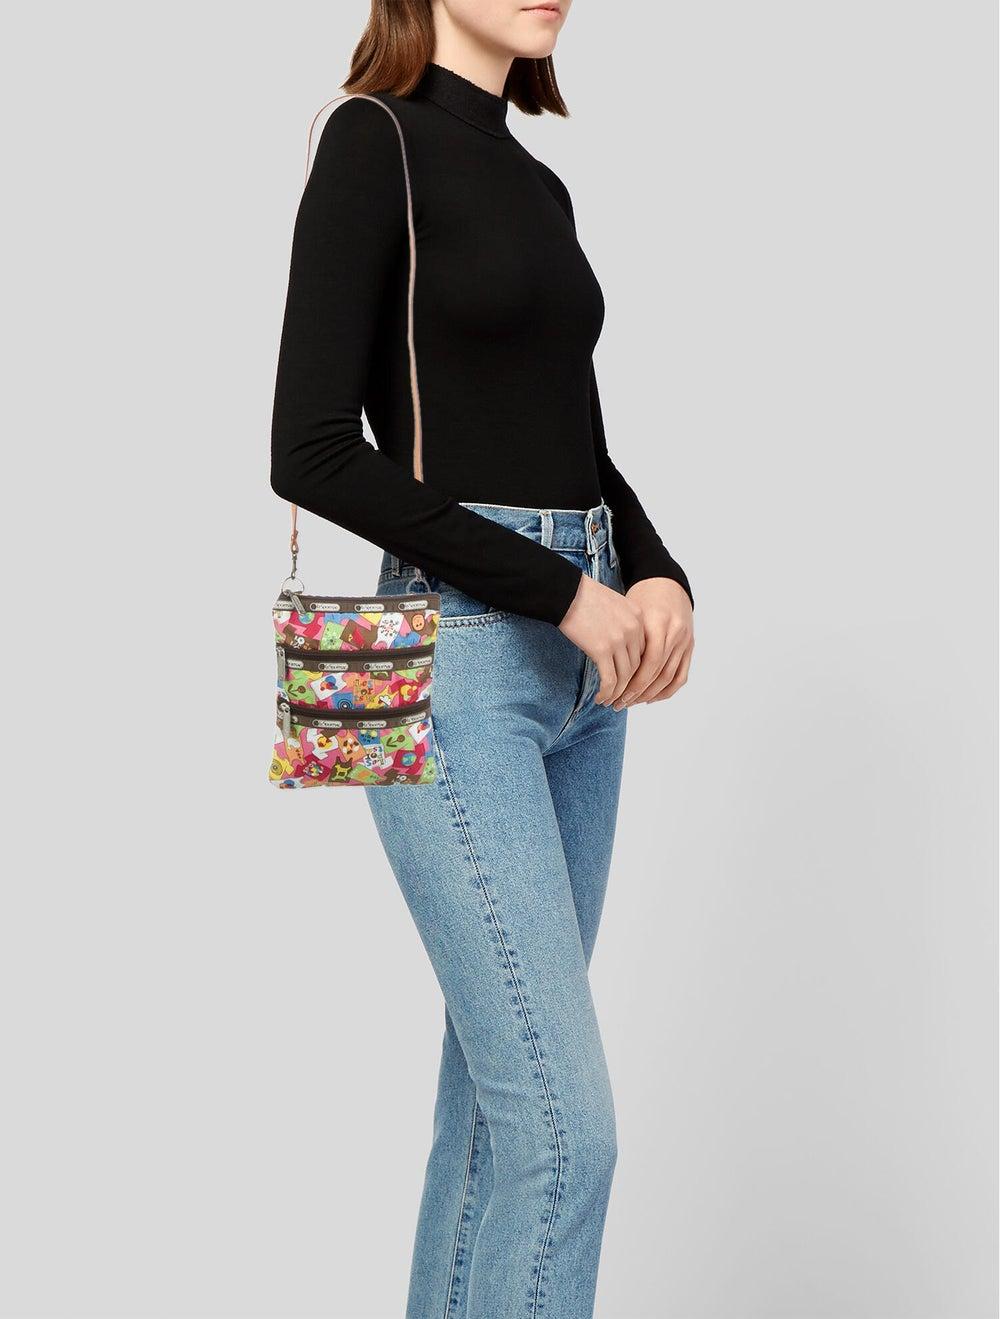 LeSportSac Nylon Shoulder Bag Silver - image 2